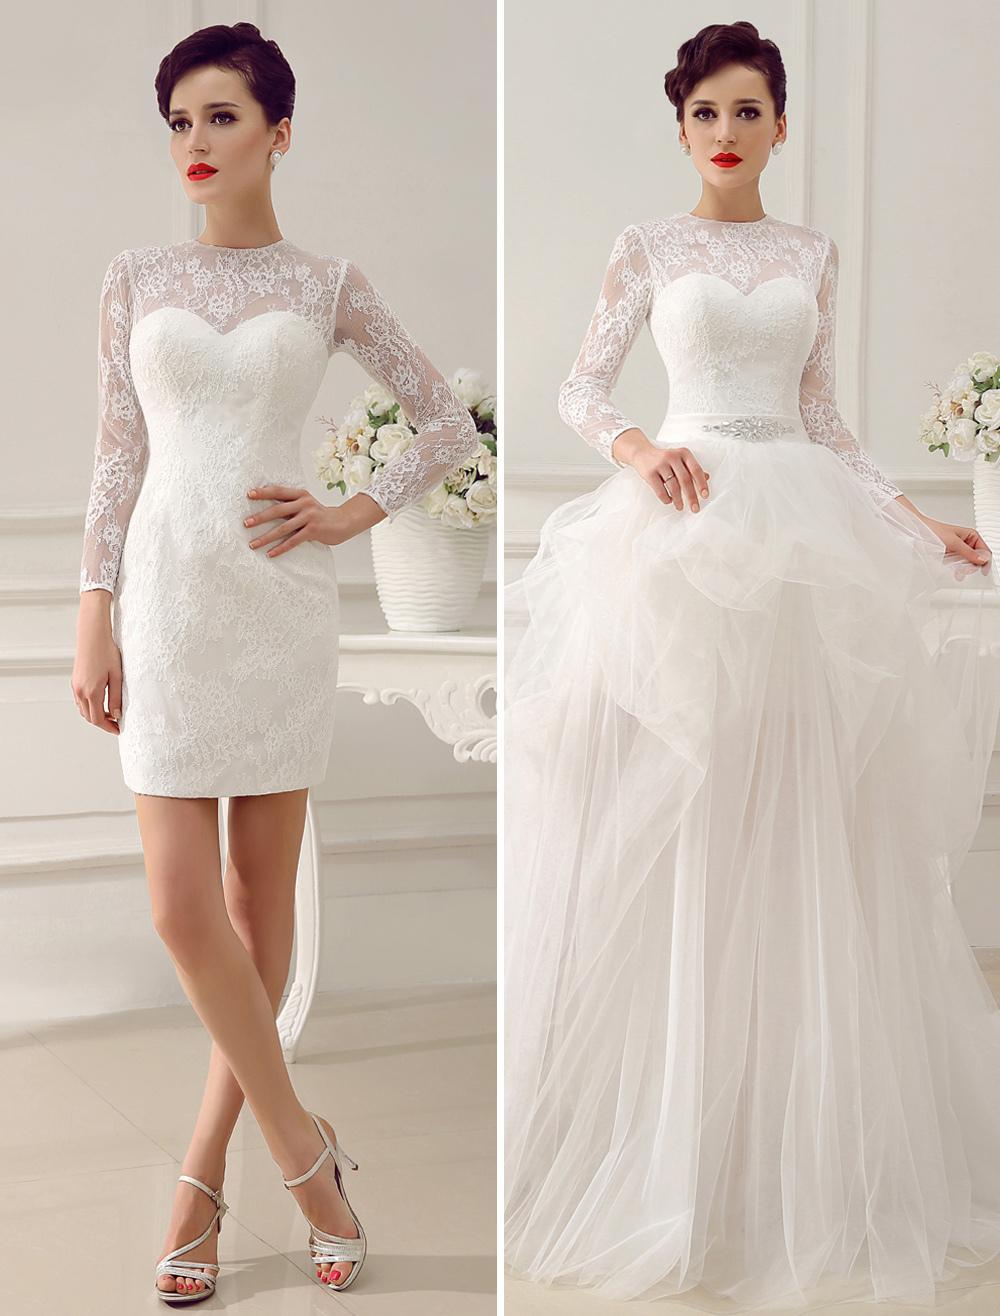 Ivory A-Line Rhinestone Lace Semi-Sheer Wedding Dress  Milanoo